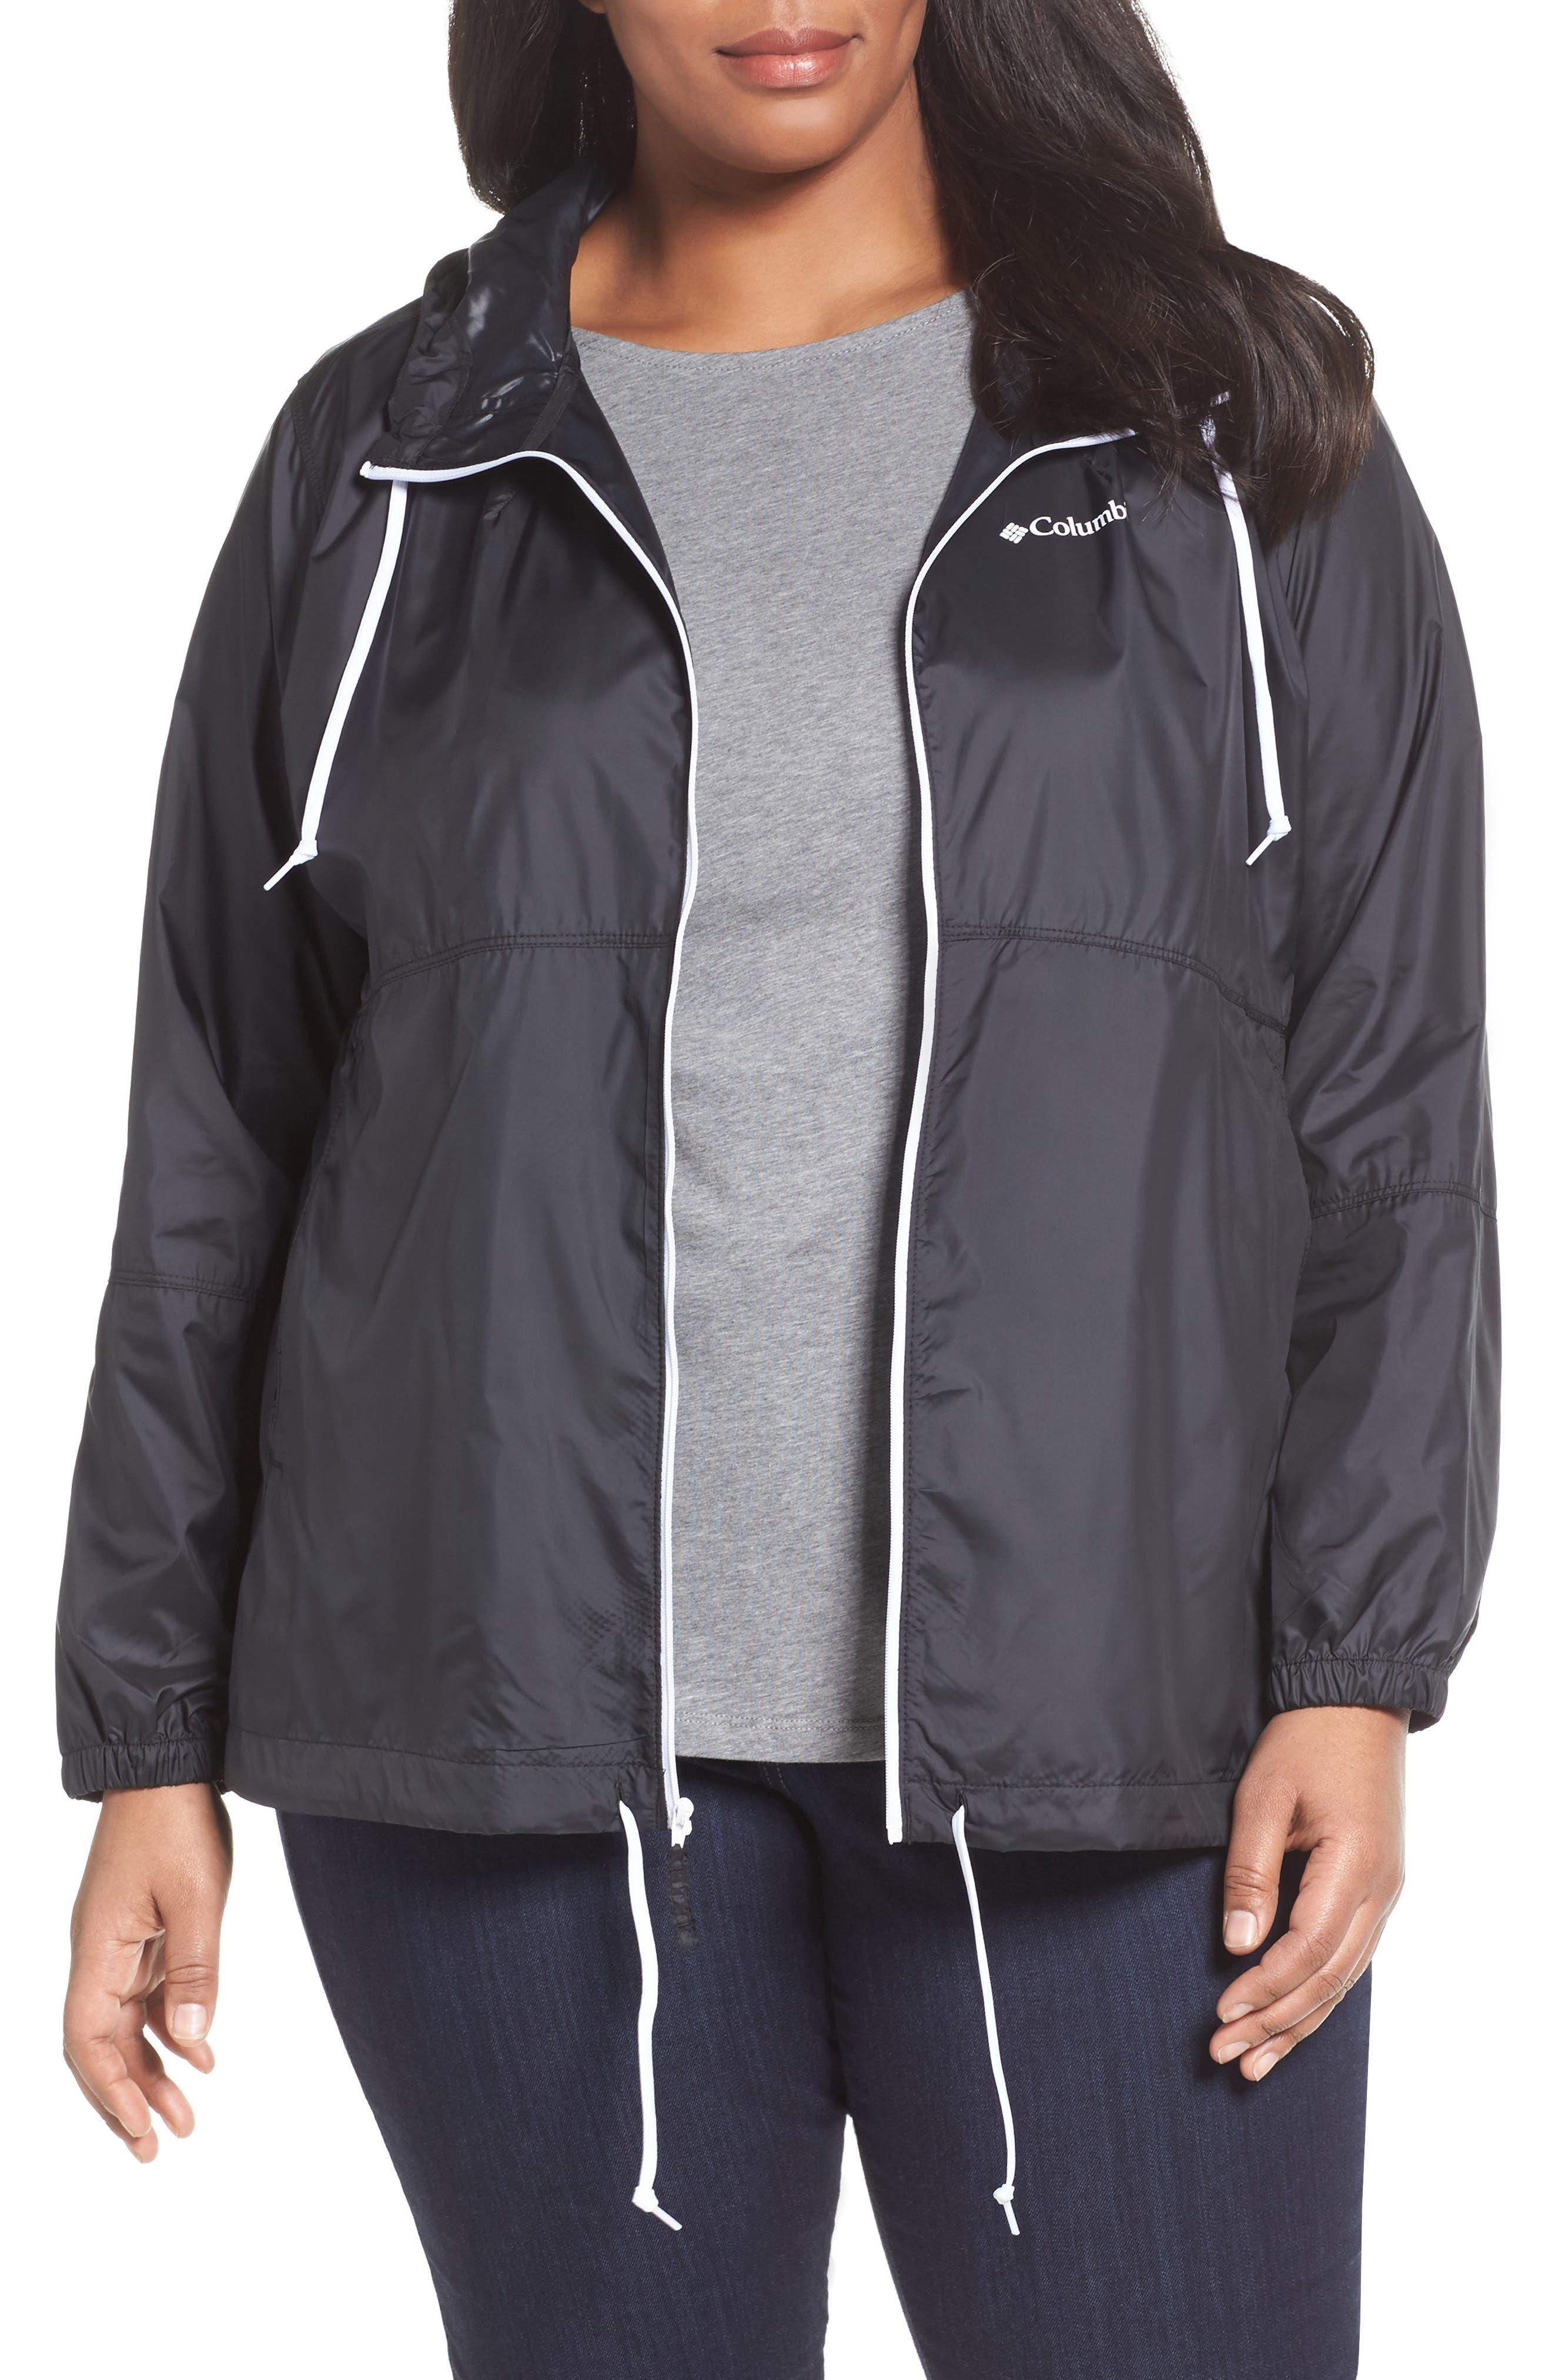 Alternate Image 1 Selected - Columbia 'Flash Forward™' Windbreaker Jacket (Plus Size)